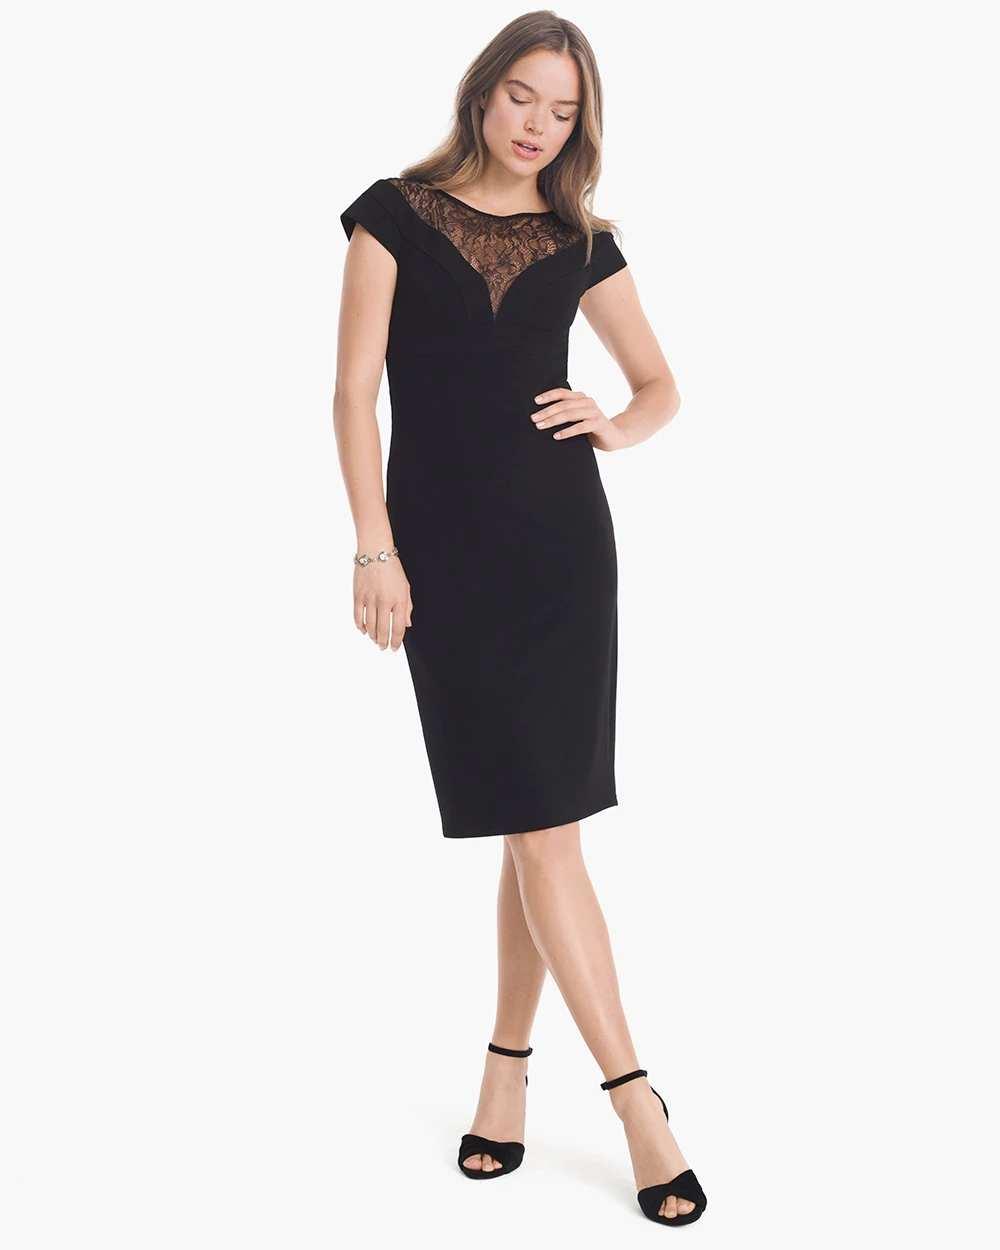 CAP-SLEEVE BLACK VEILING SHIFT DRESS   Hermosaz